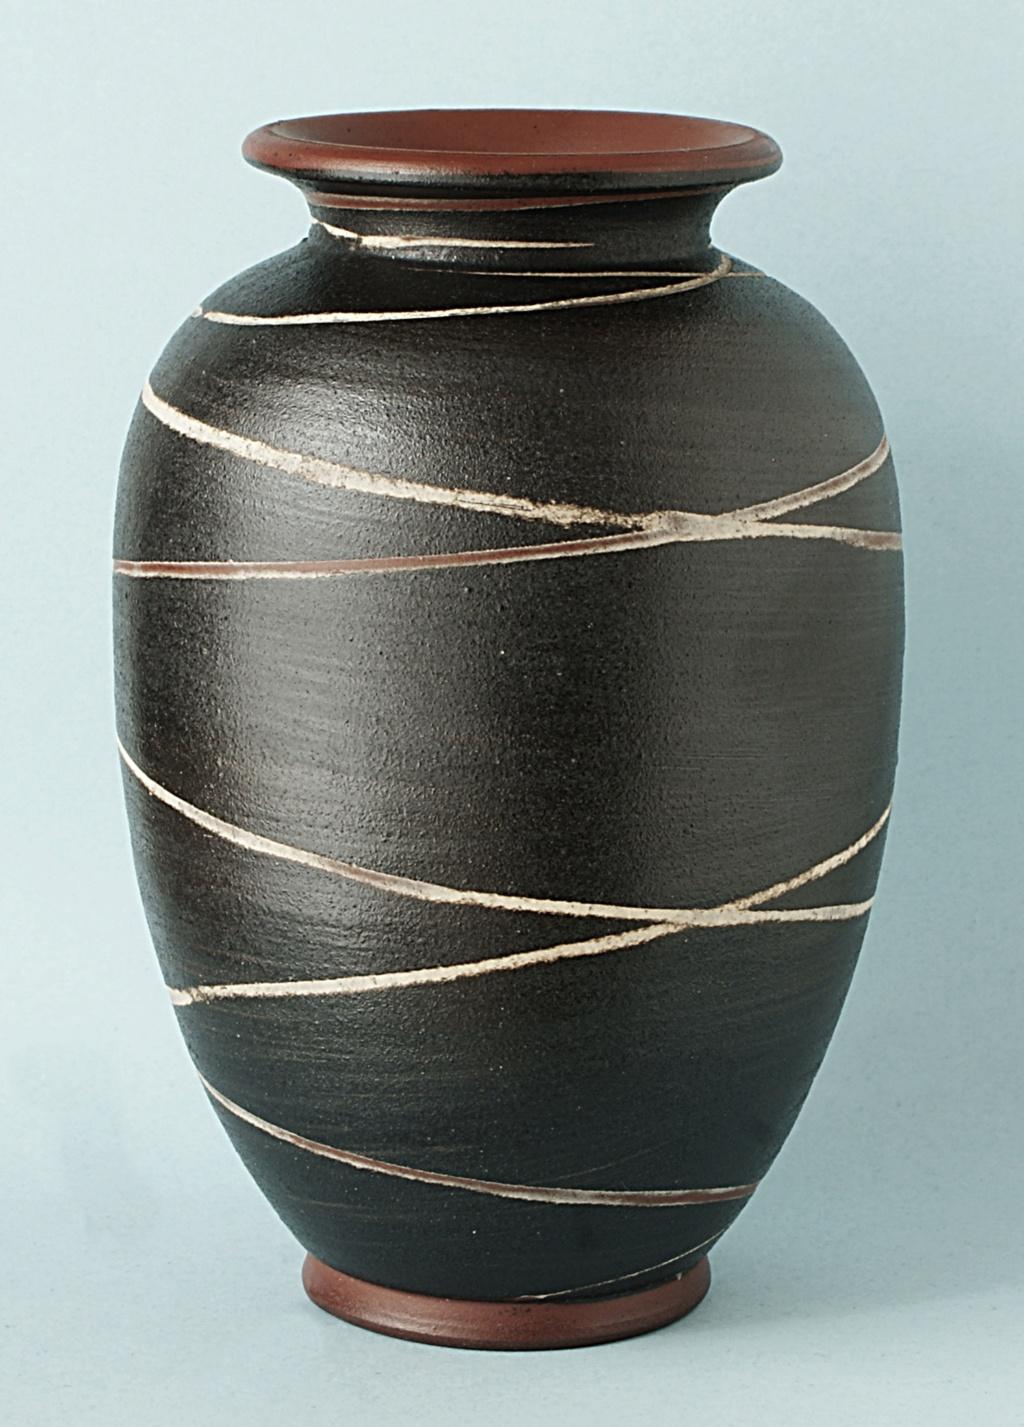 German Pottery Vase: Geseztlich Geschutz.  Dsc04715